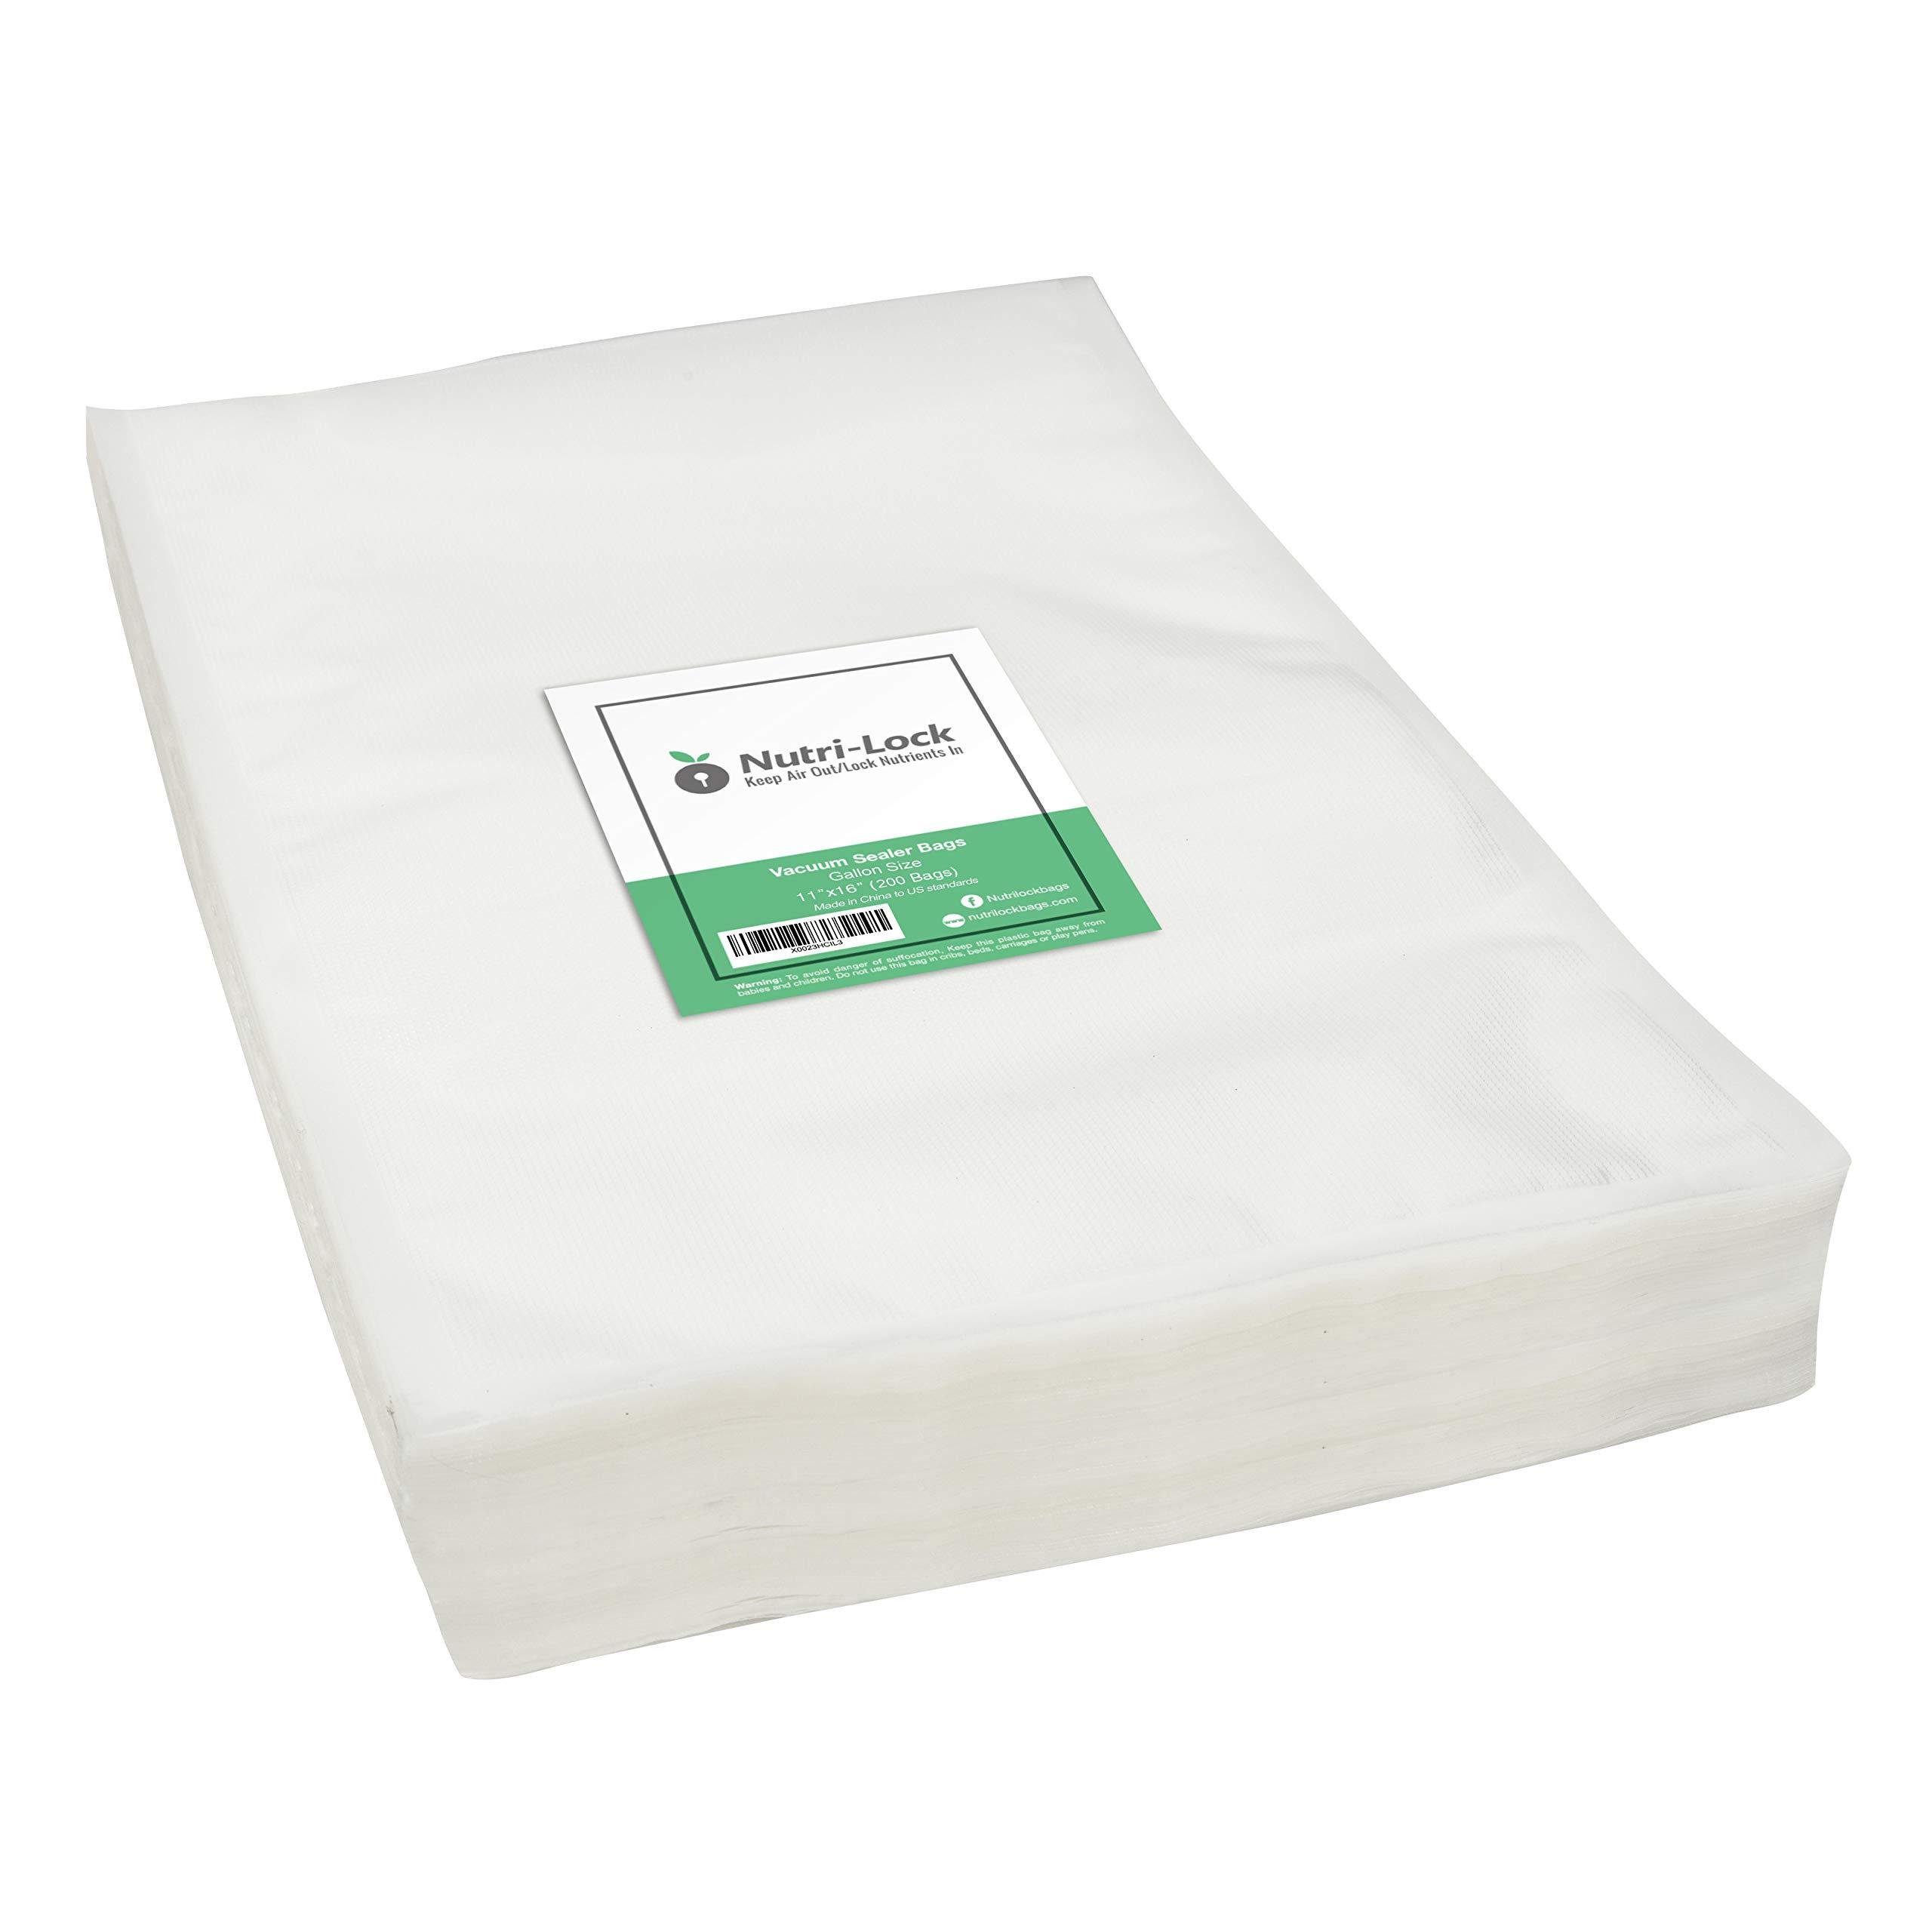 Nutri-Lock Vacuum Sealer Bags. 200 Gallon Bags 11x16 Inch. Commercial Grade Food Sealer Bags for FoodSaver, Sous Vide by Nutri-Lock